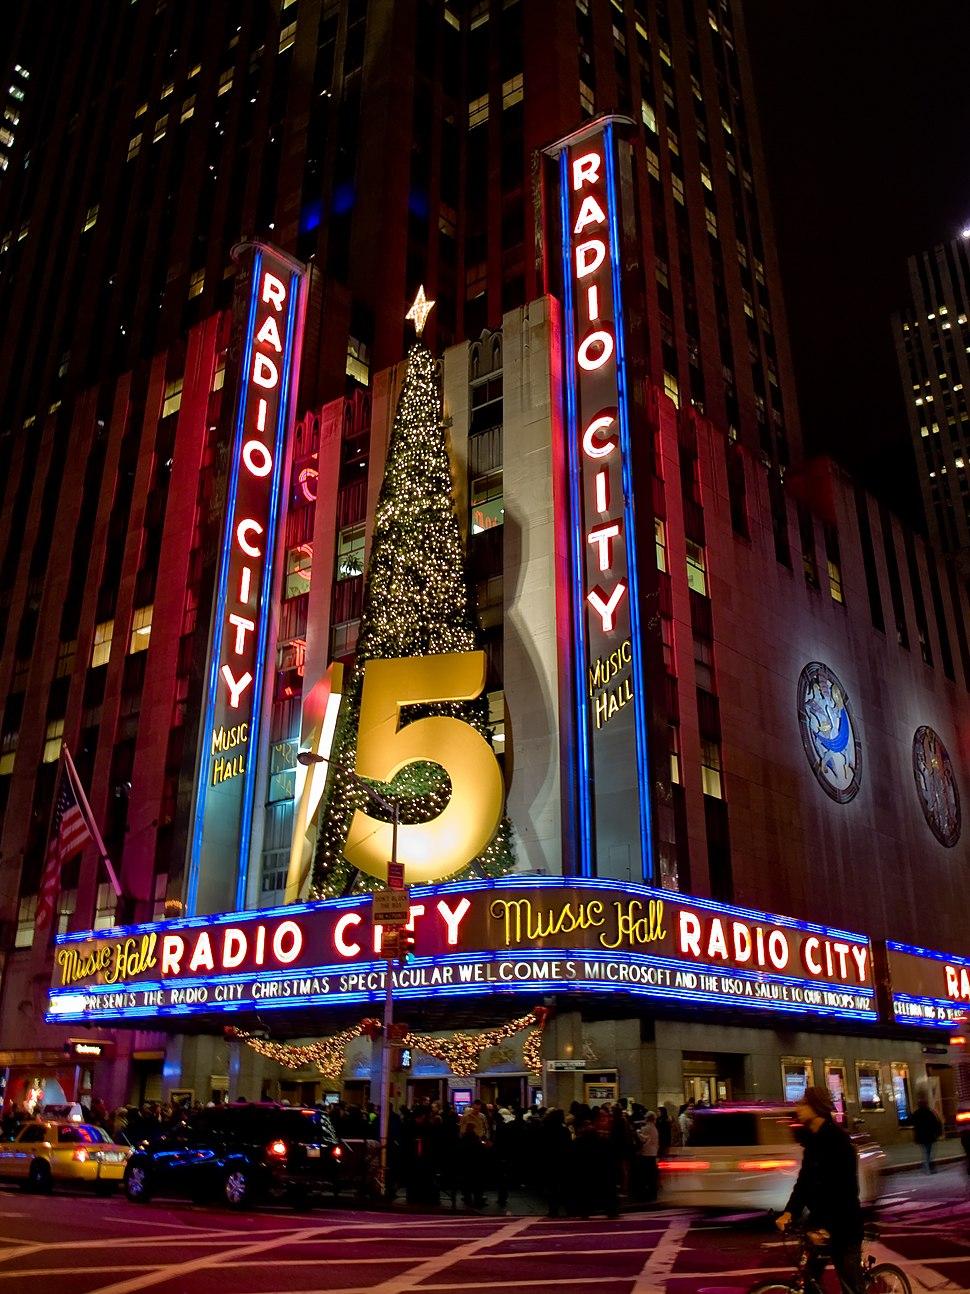 Radio City Music Hall 2229954271 675a3a4551